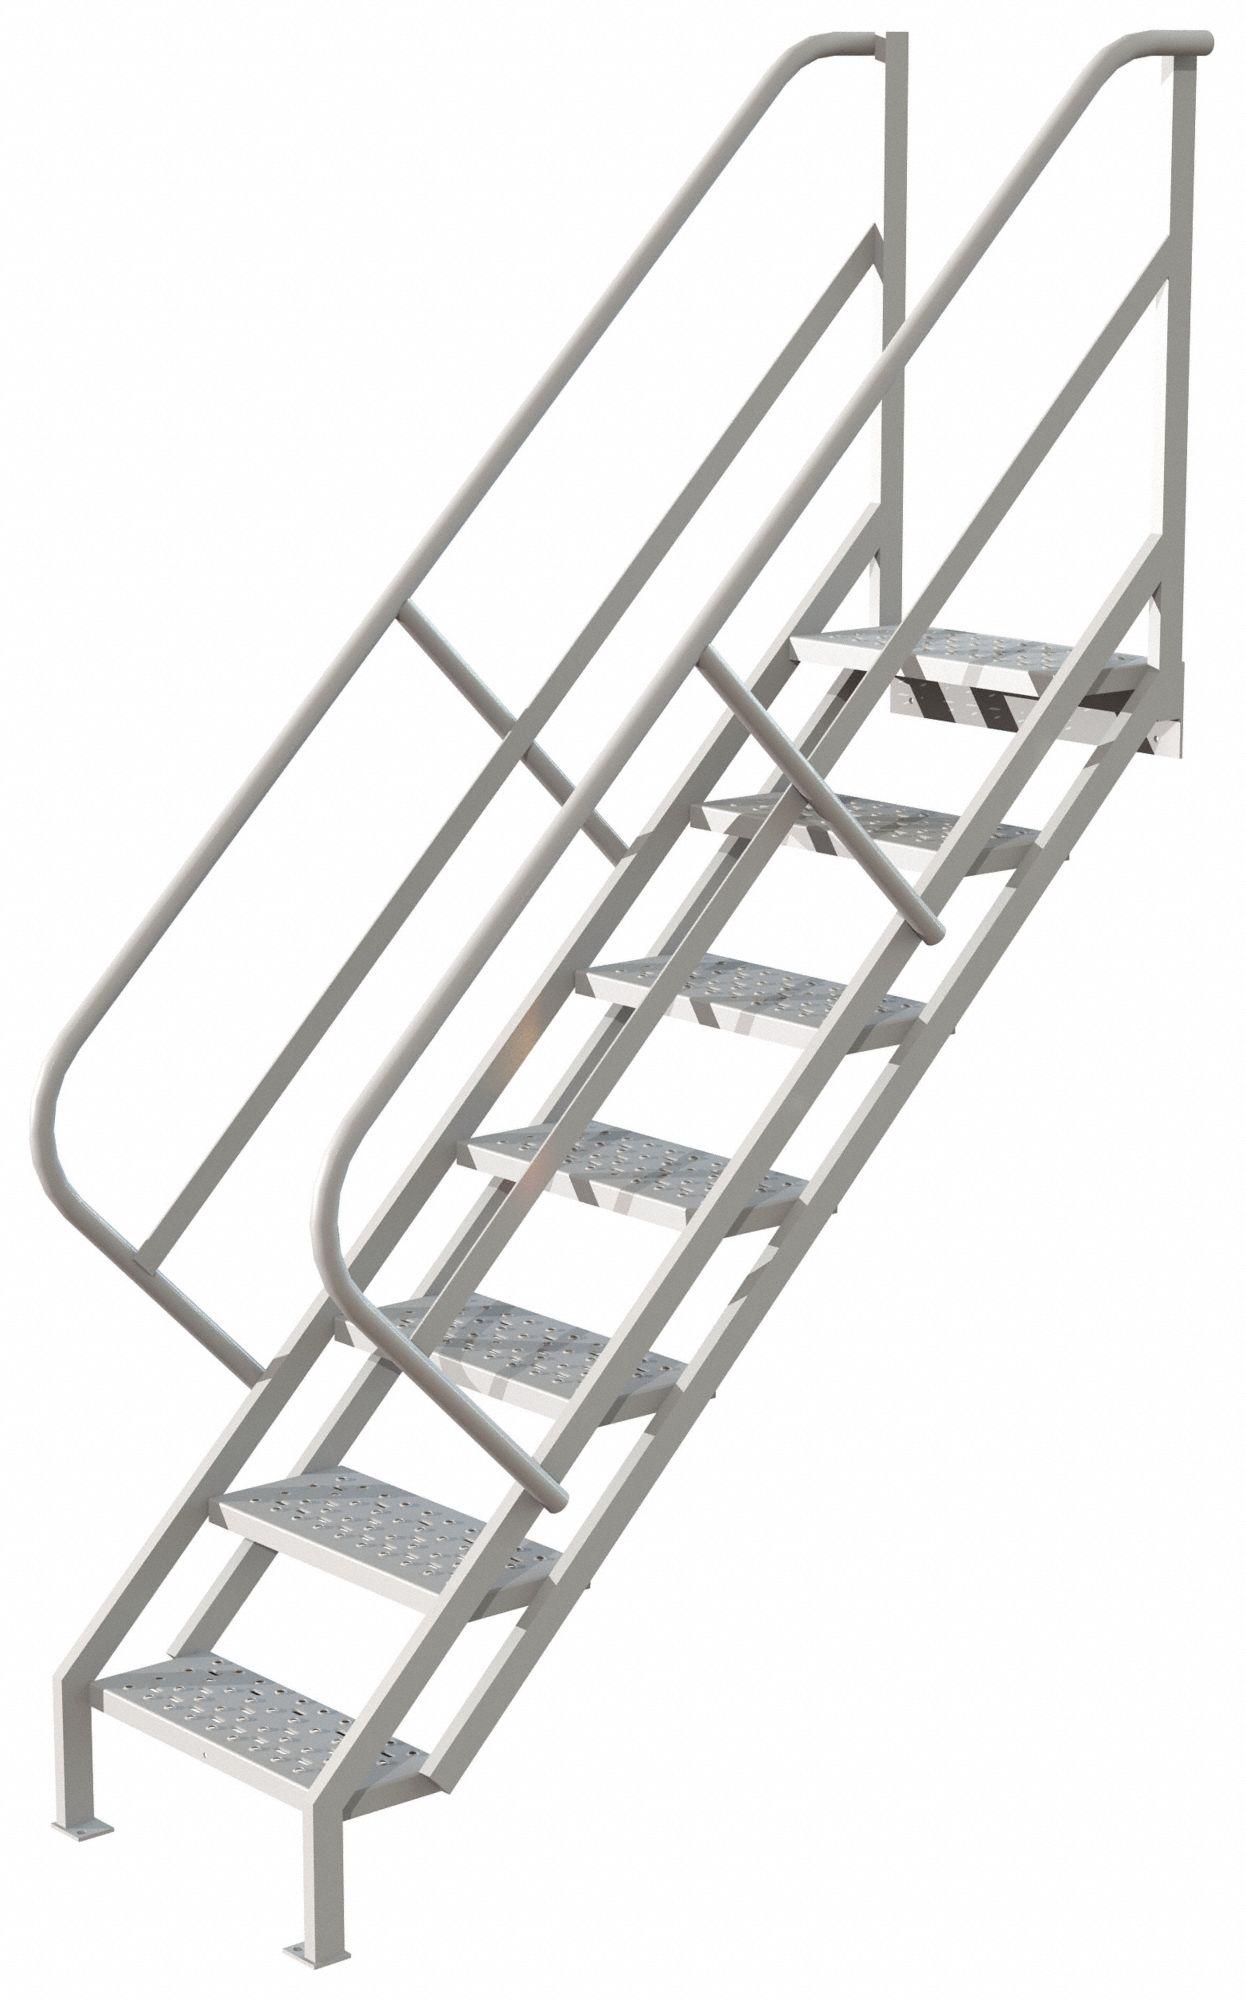 TRI-ARC Steel Stair Unit, 66-1/2